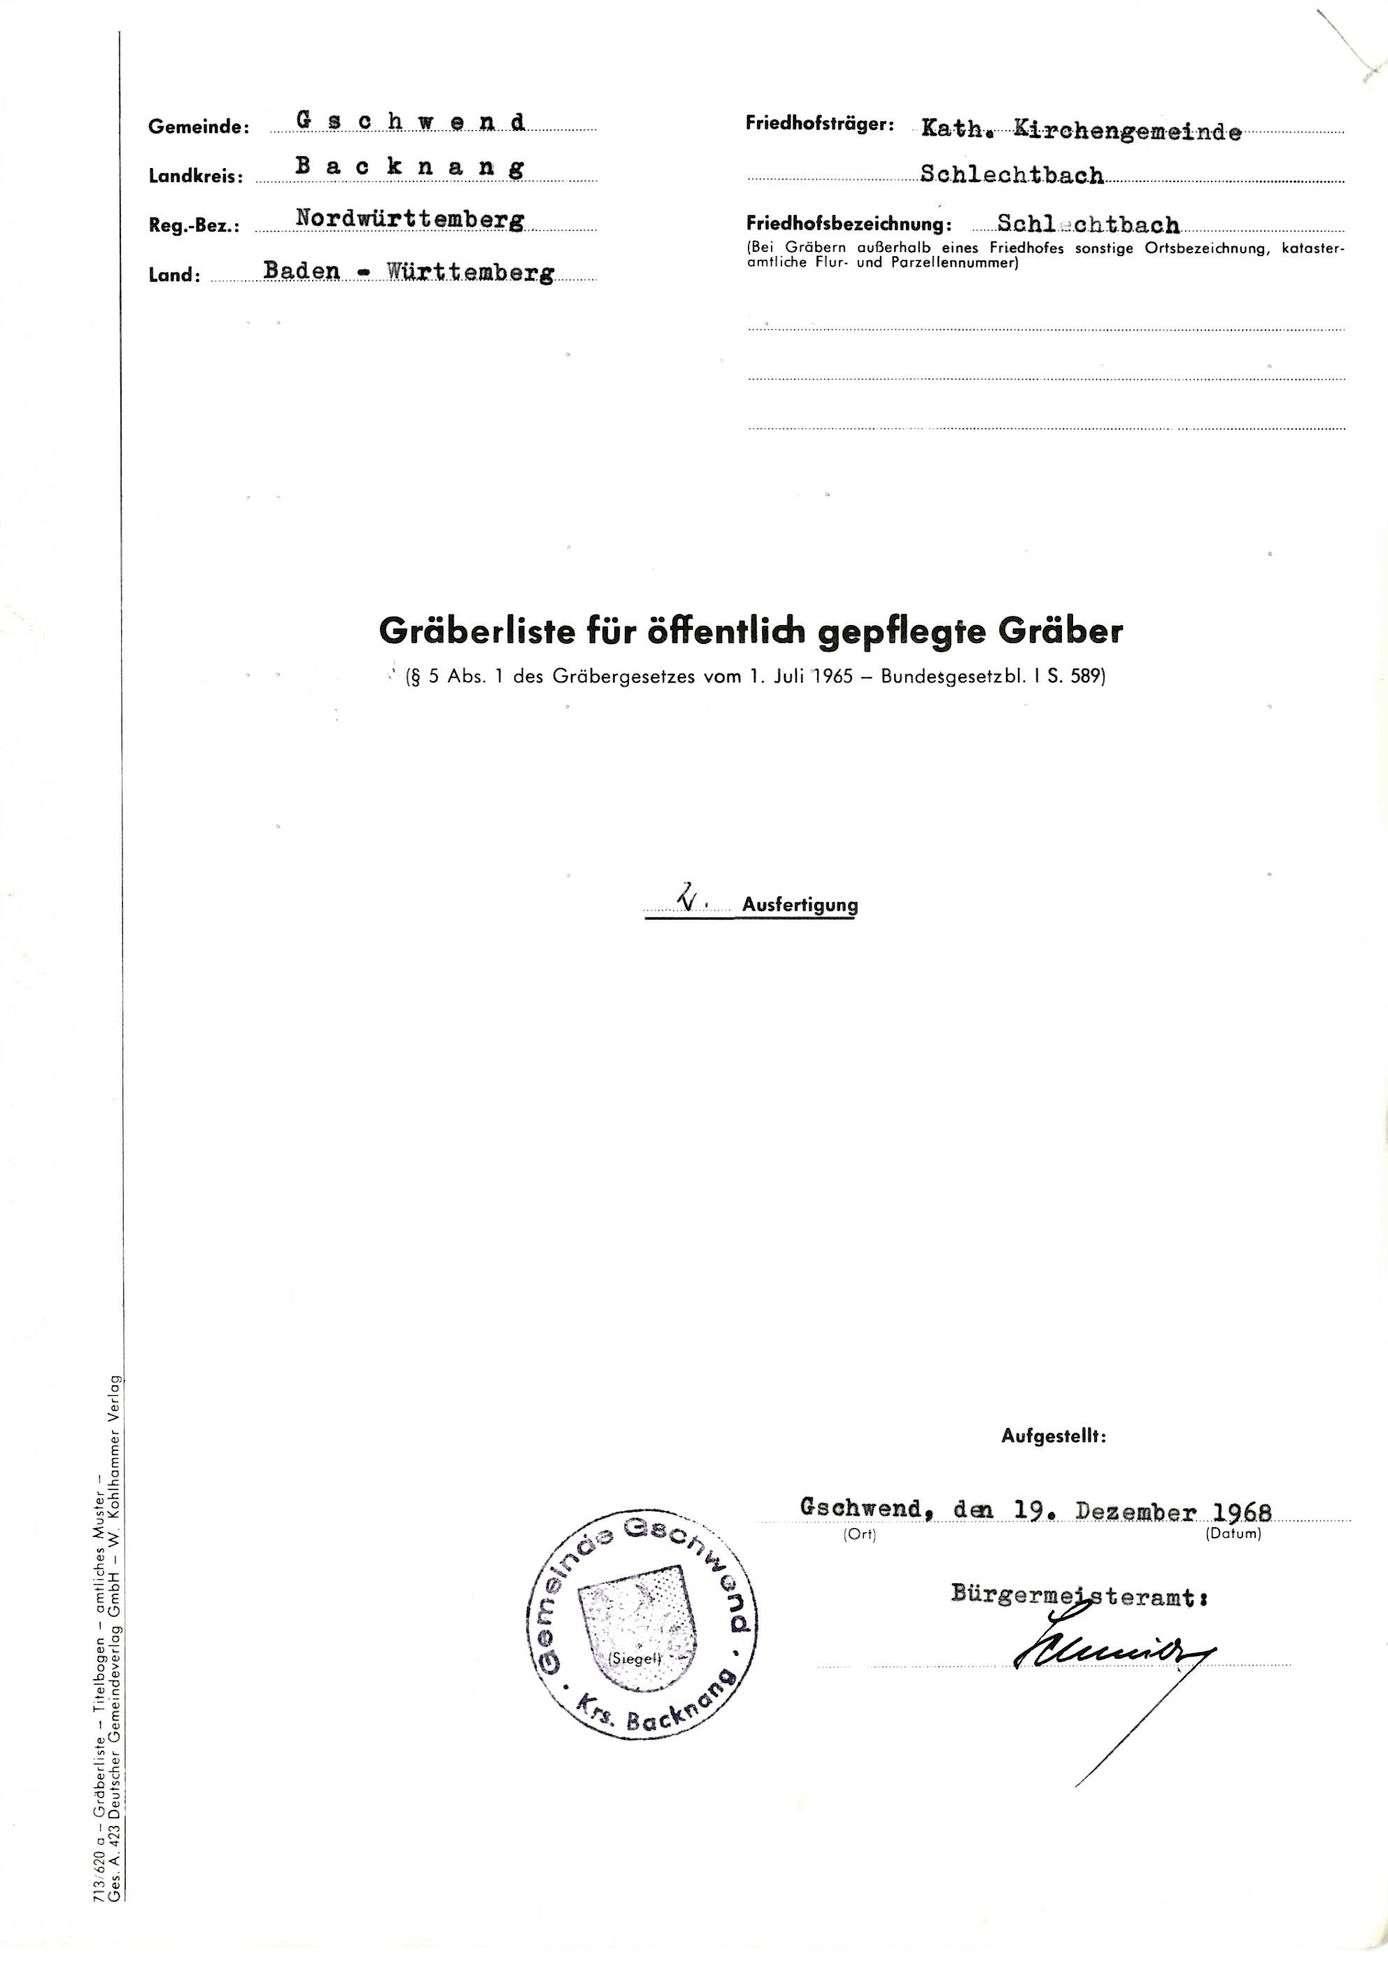 Schlechtbach, Bild 1